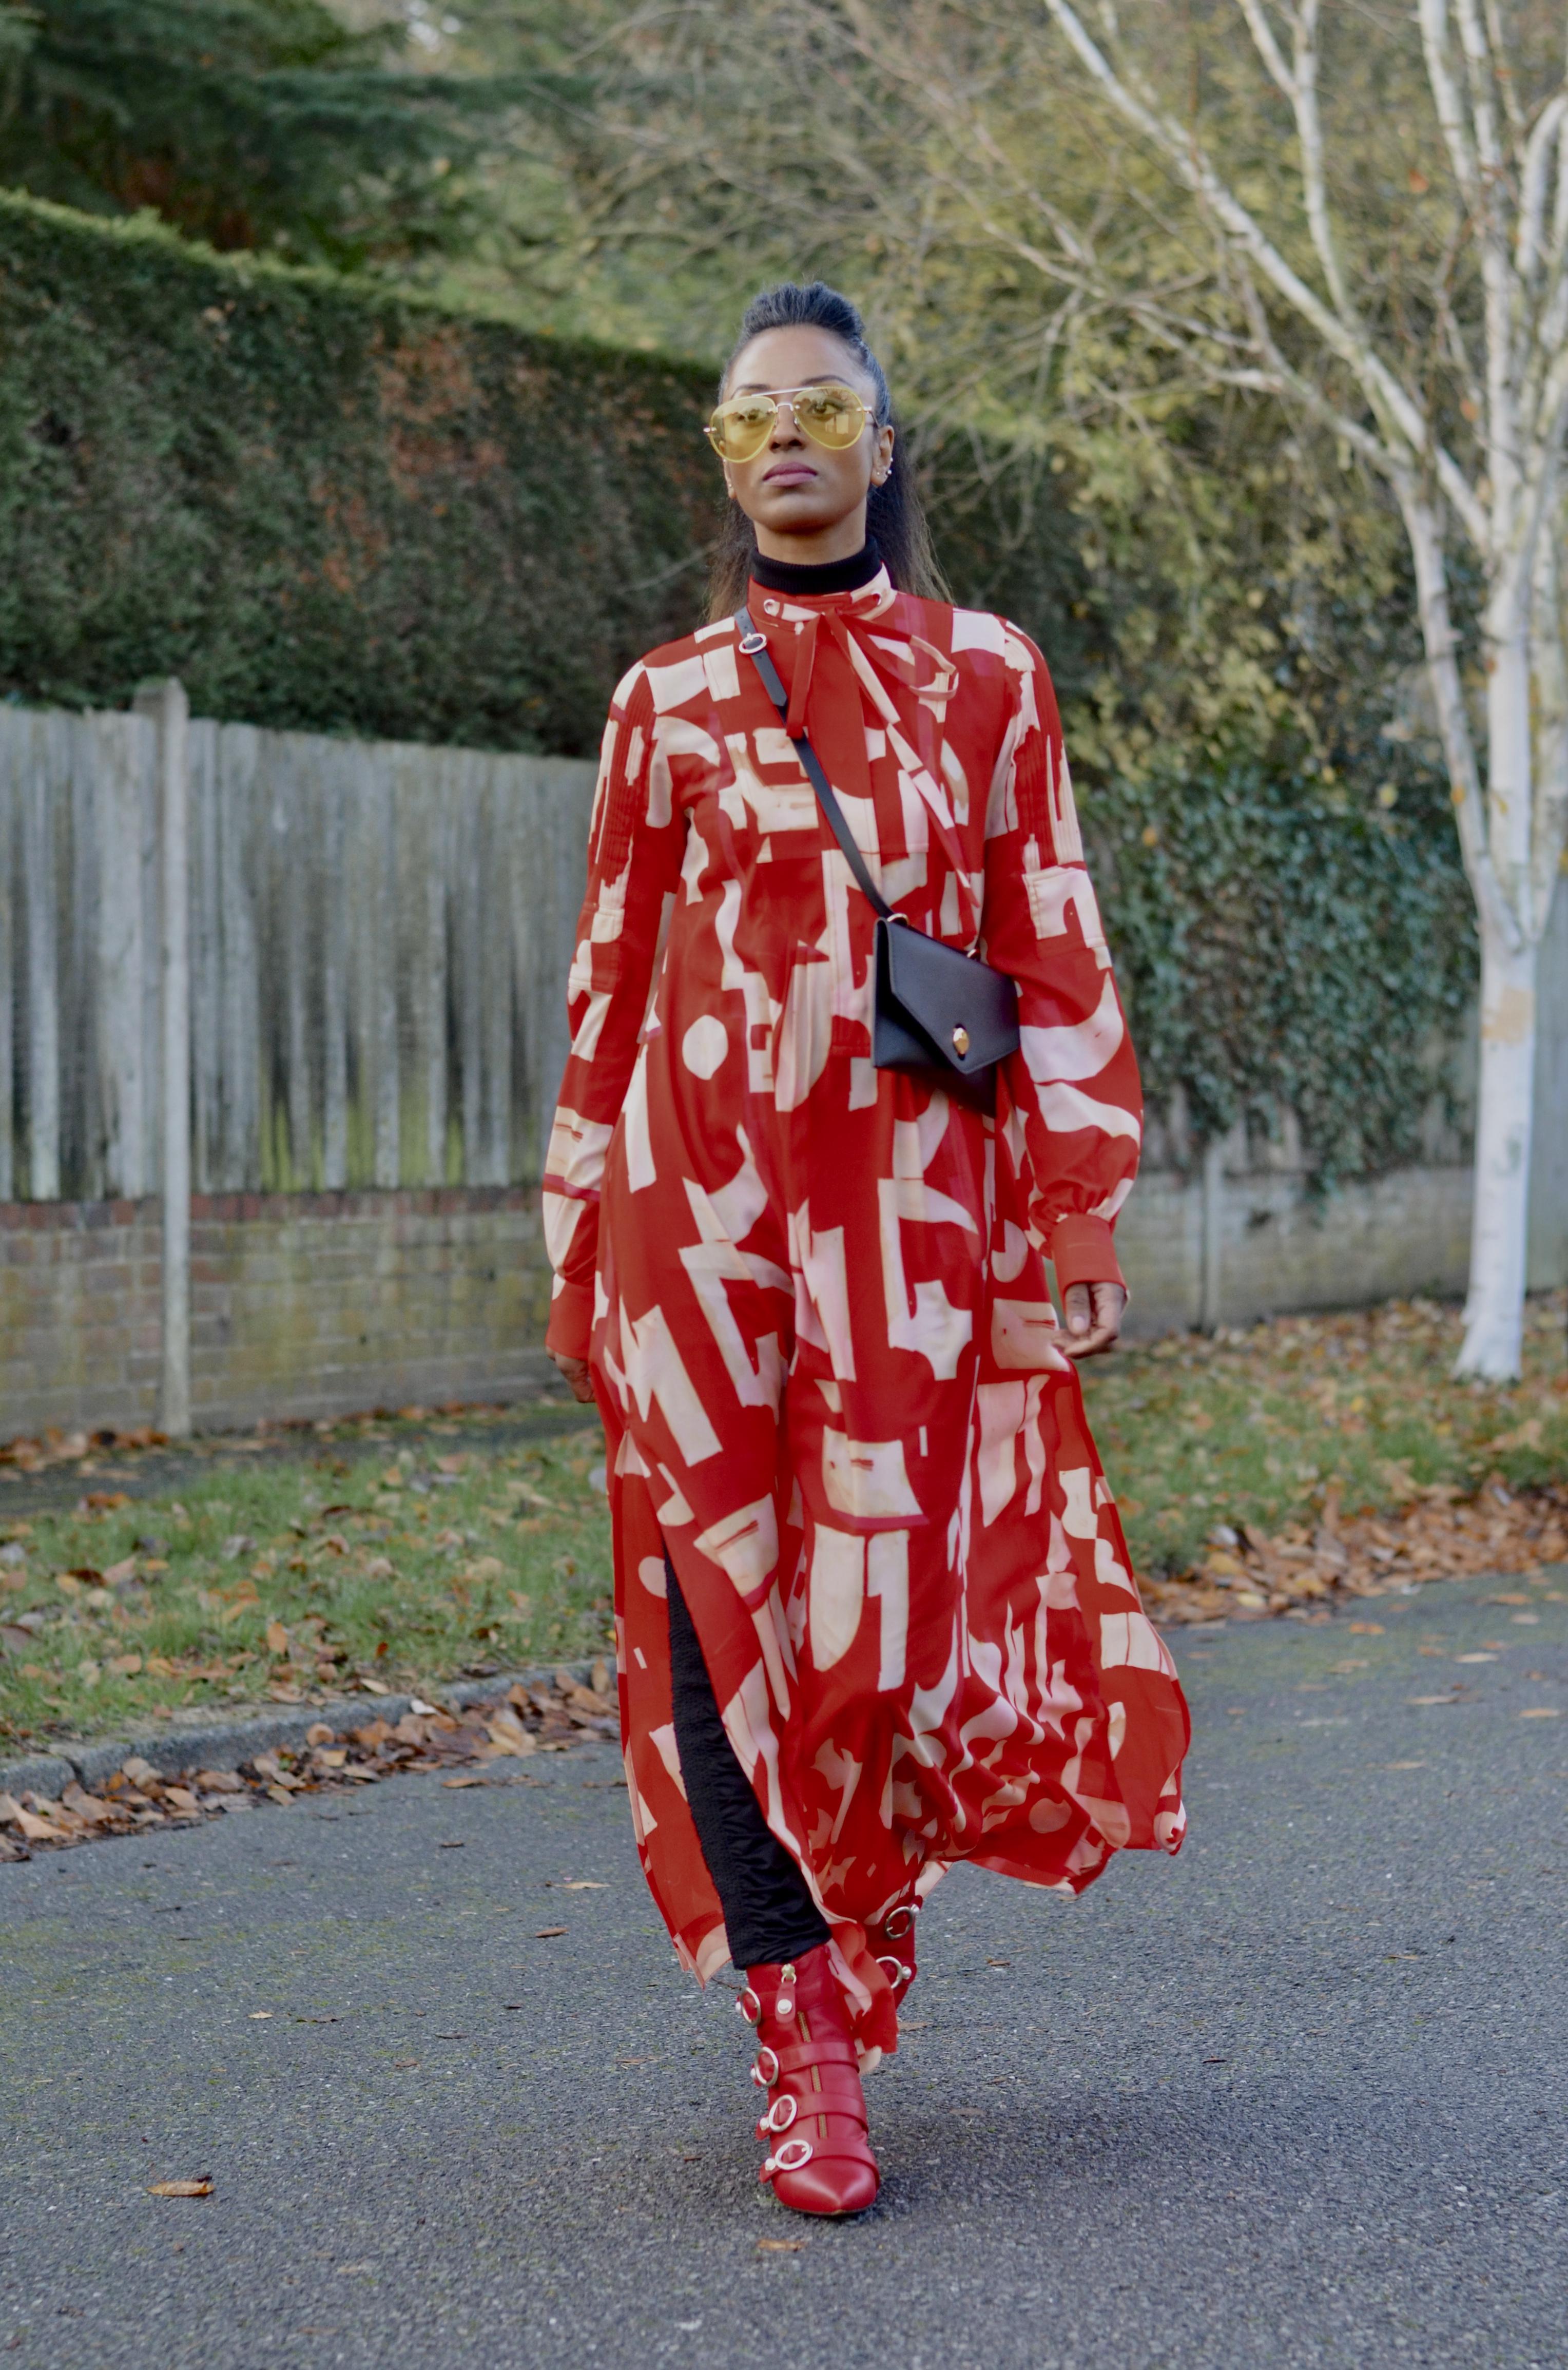 SASS & BIDE LEGGINGS AND H &M MAXI DRESS